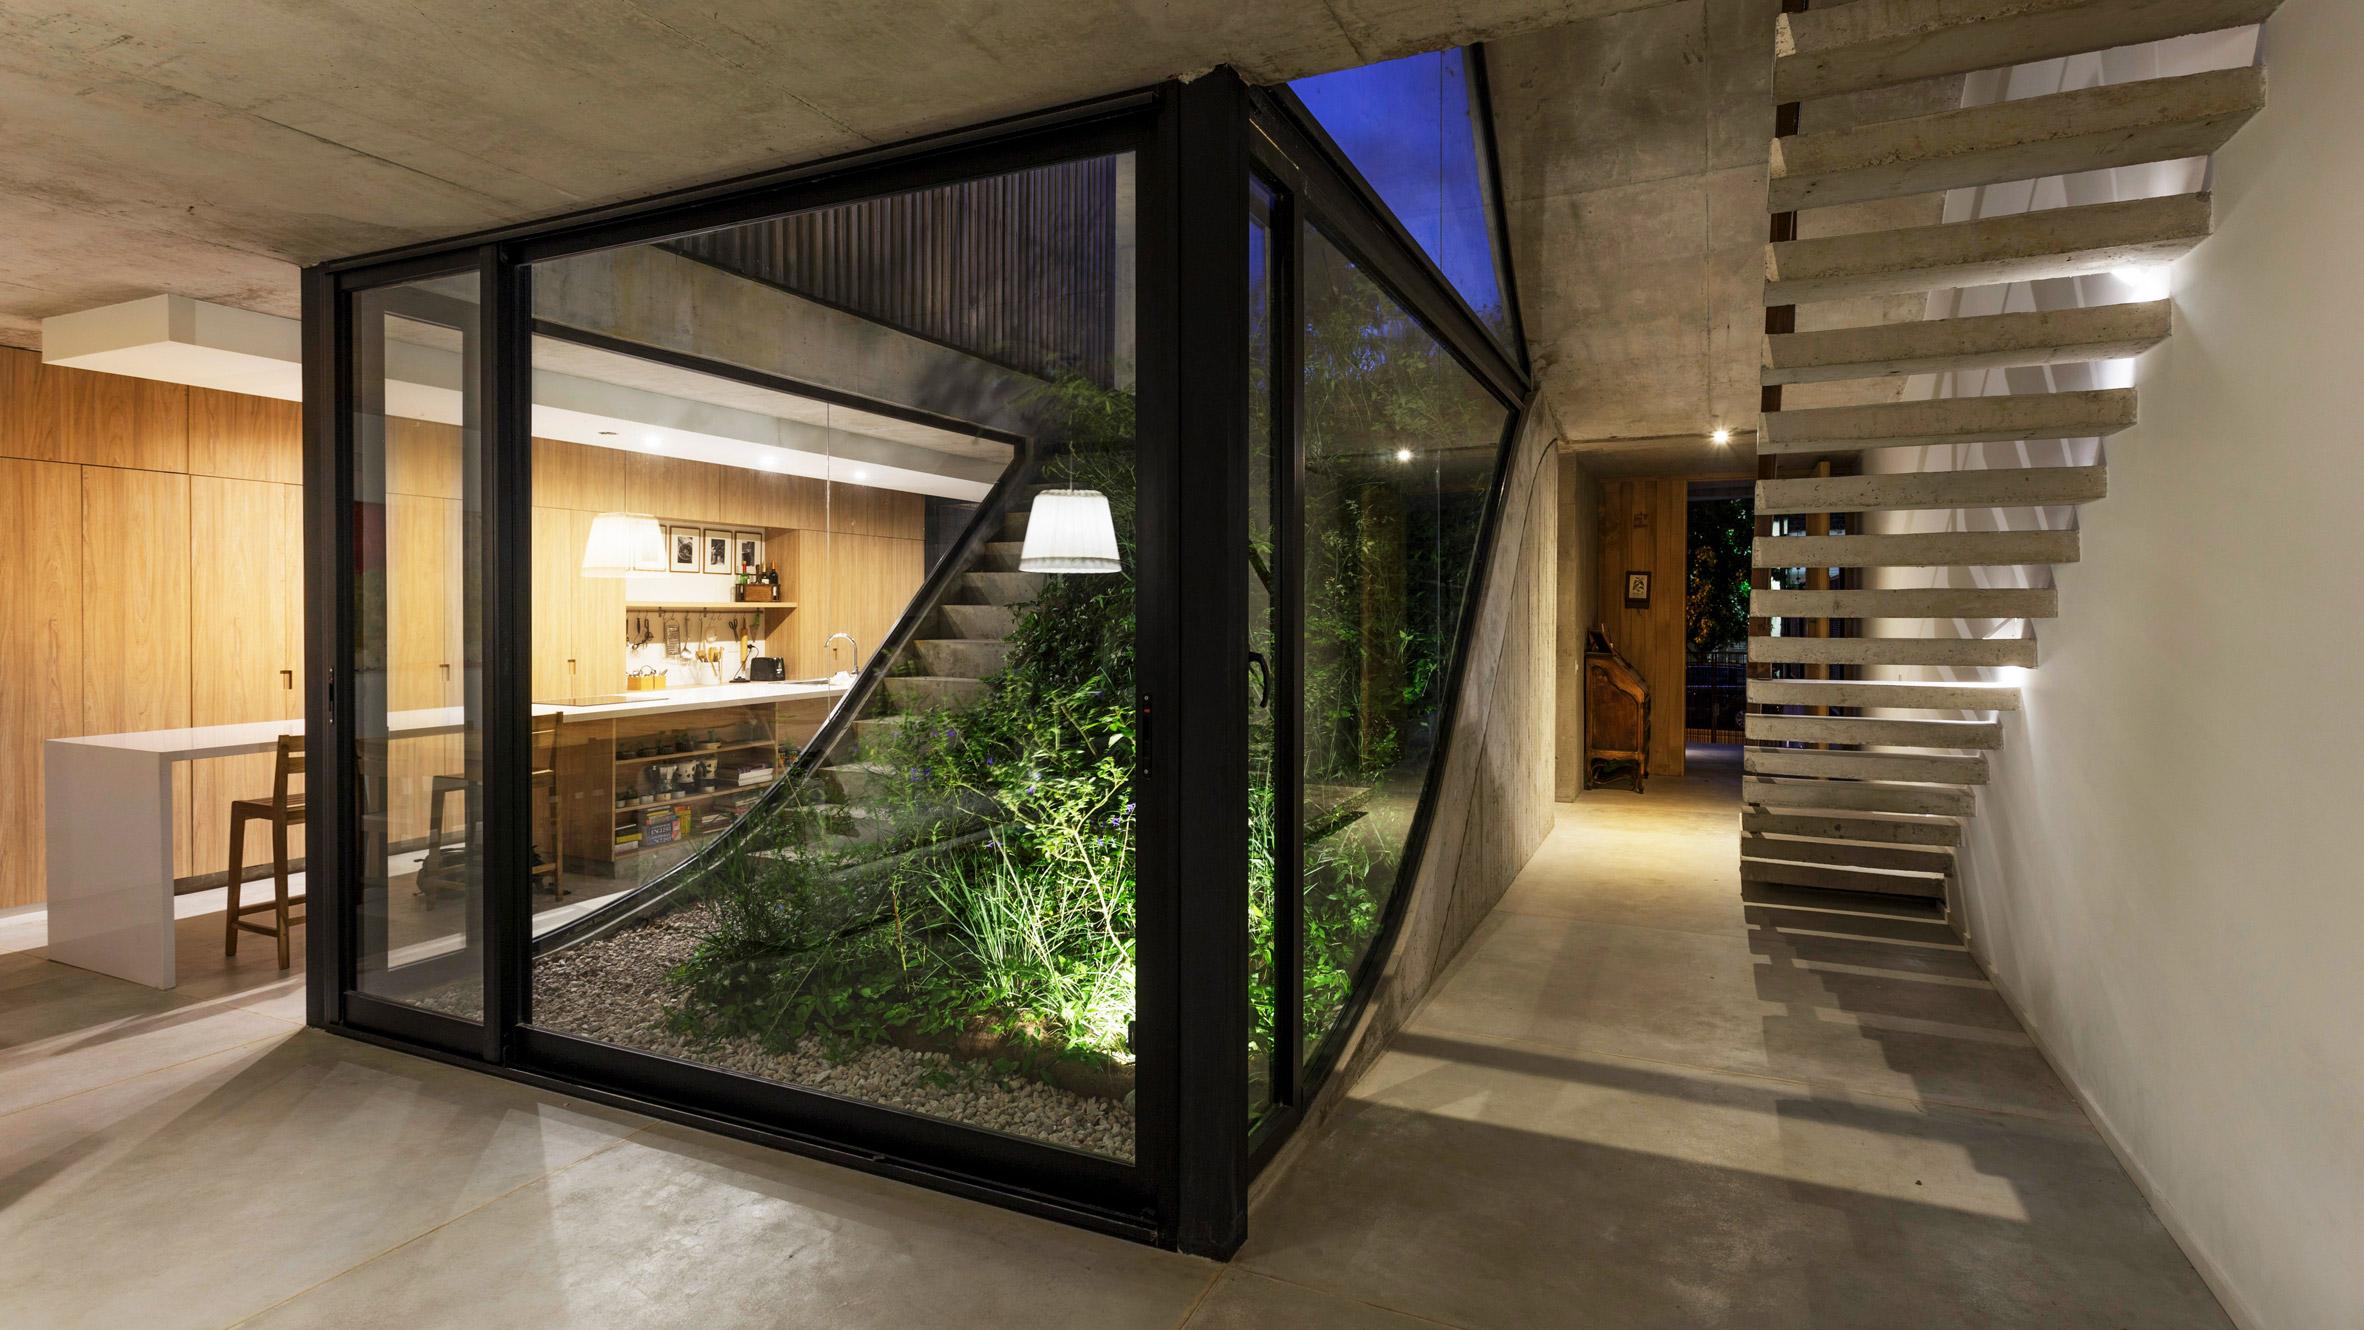 House MeMo by BAM! arquitectura